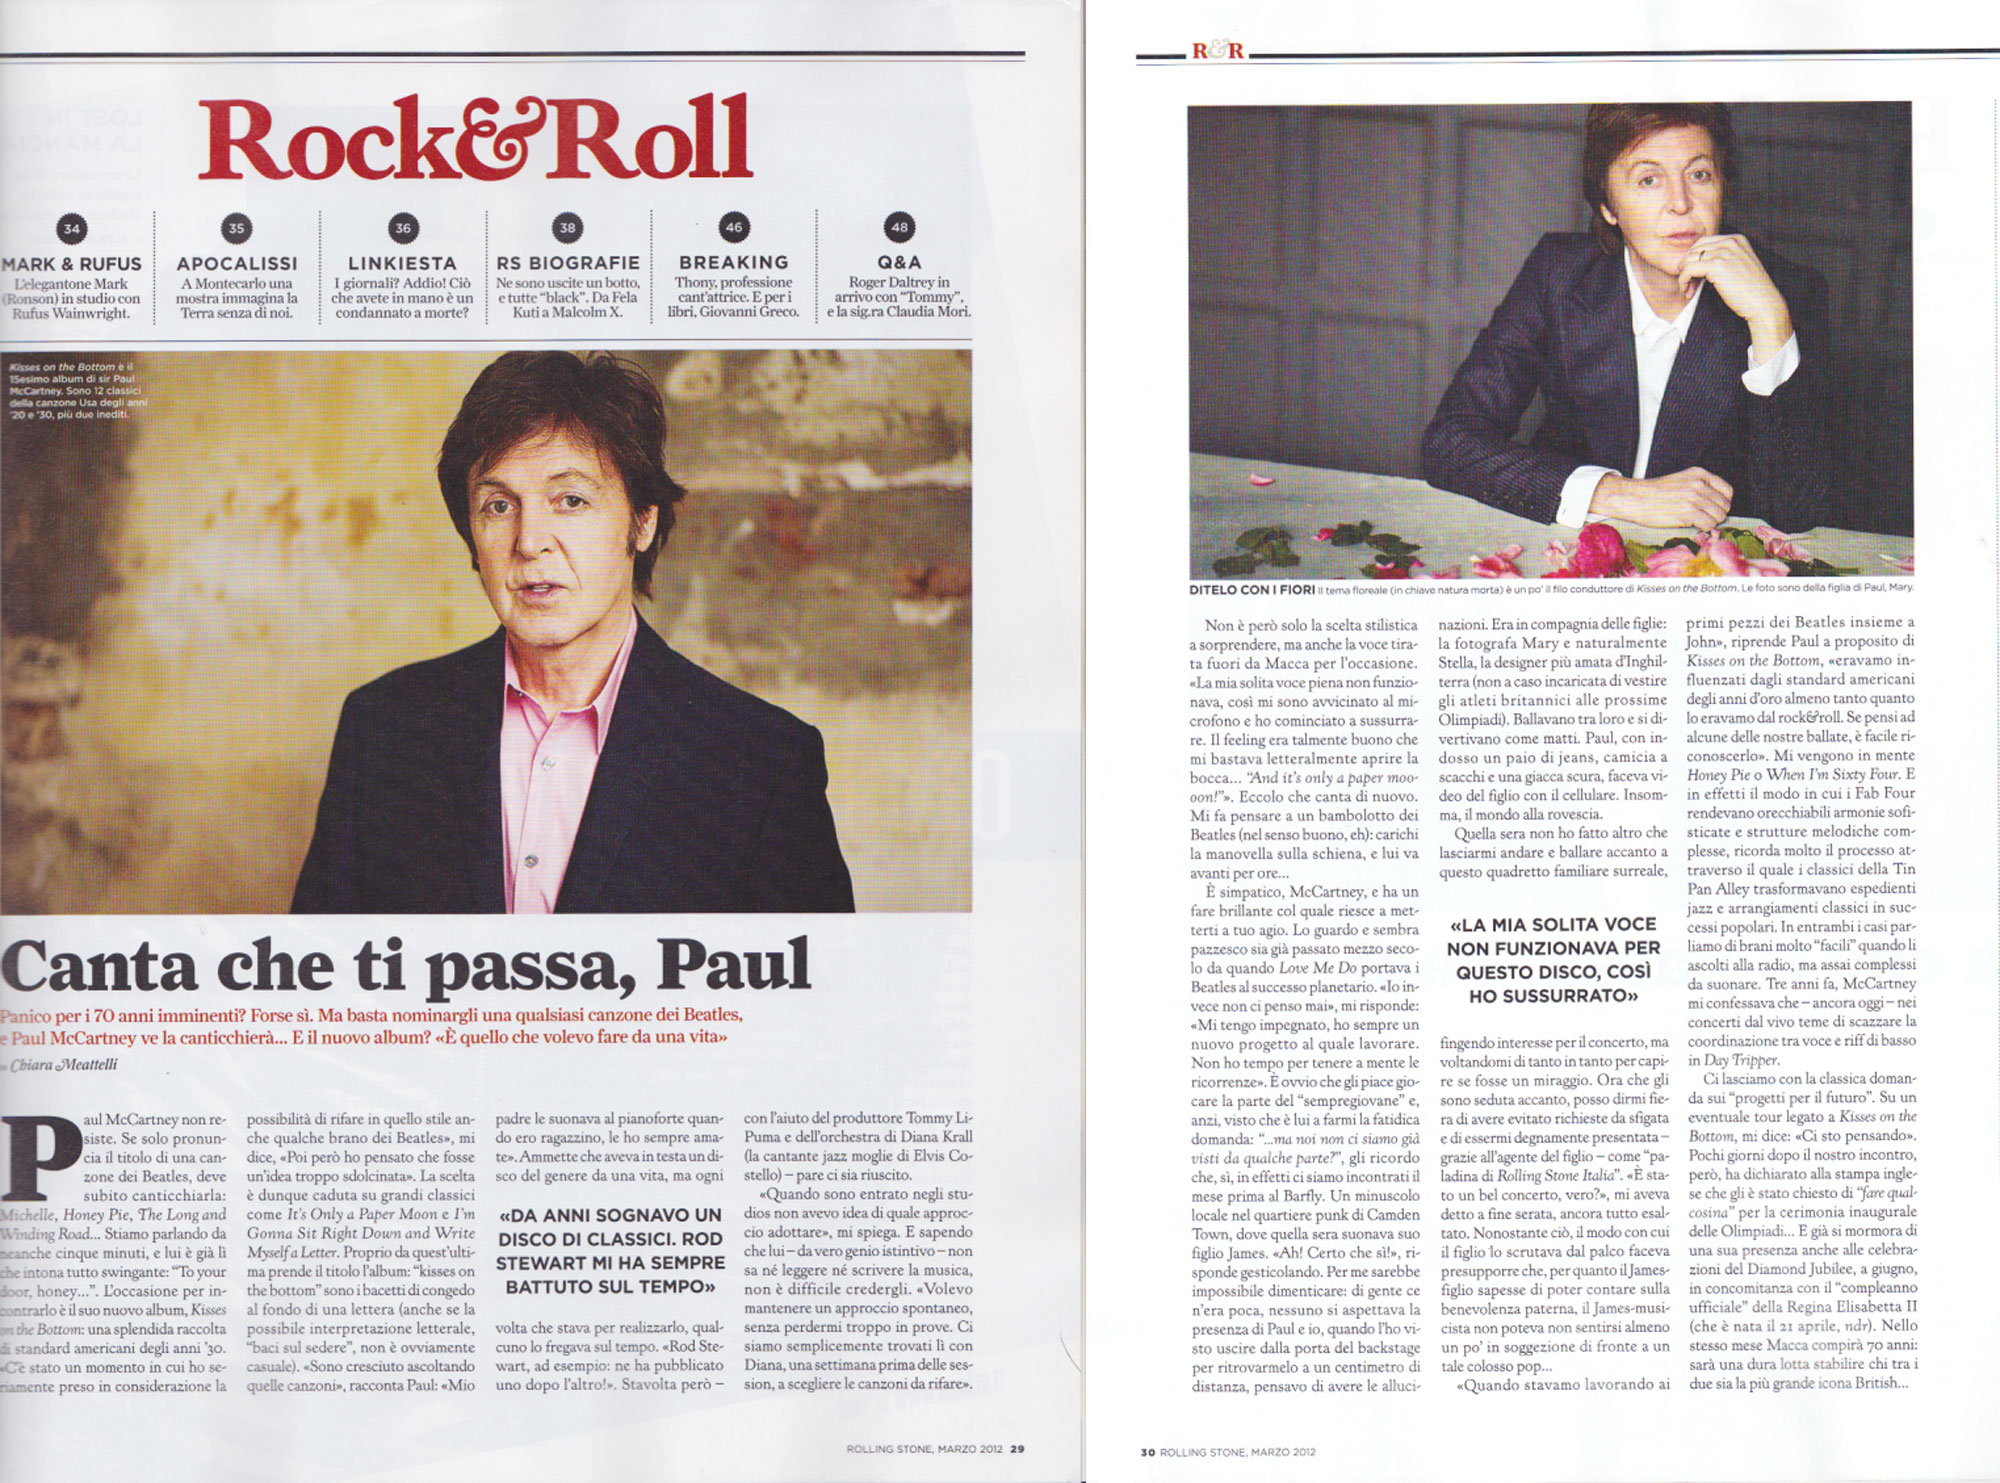 Rolling Stone magazine: Paul McCartney interview